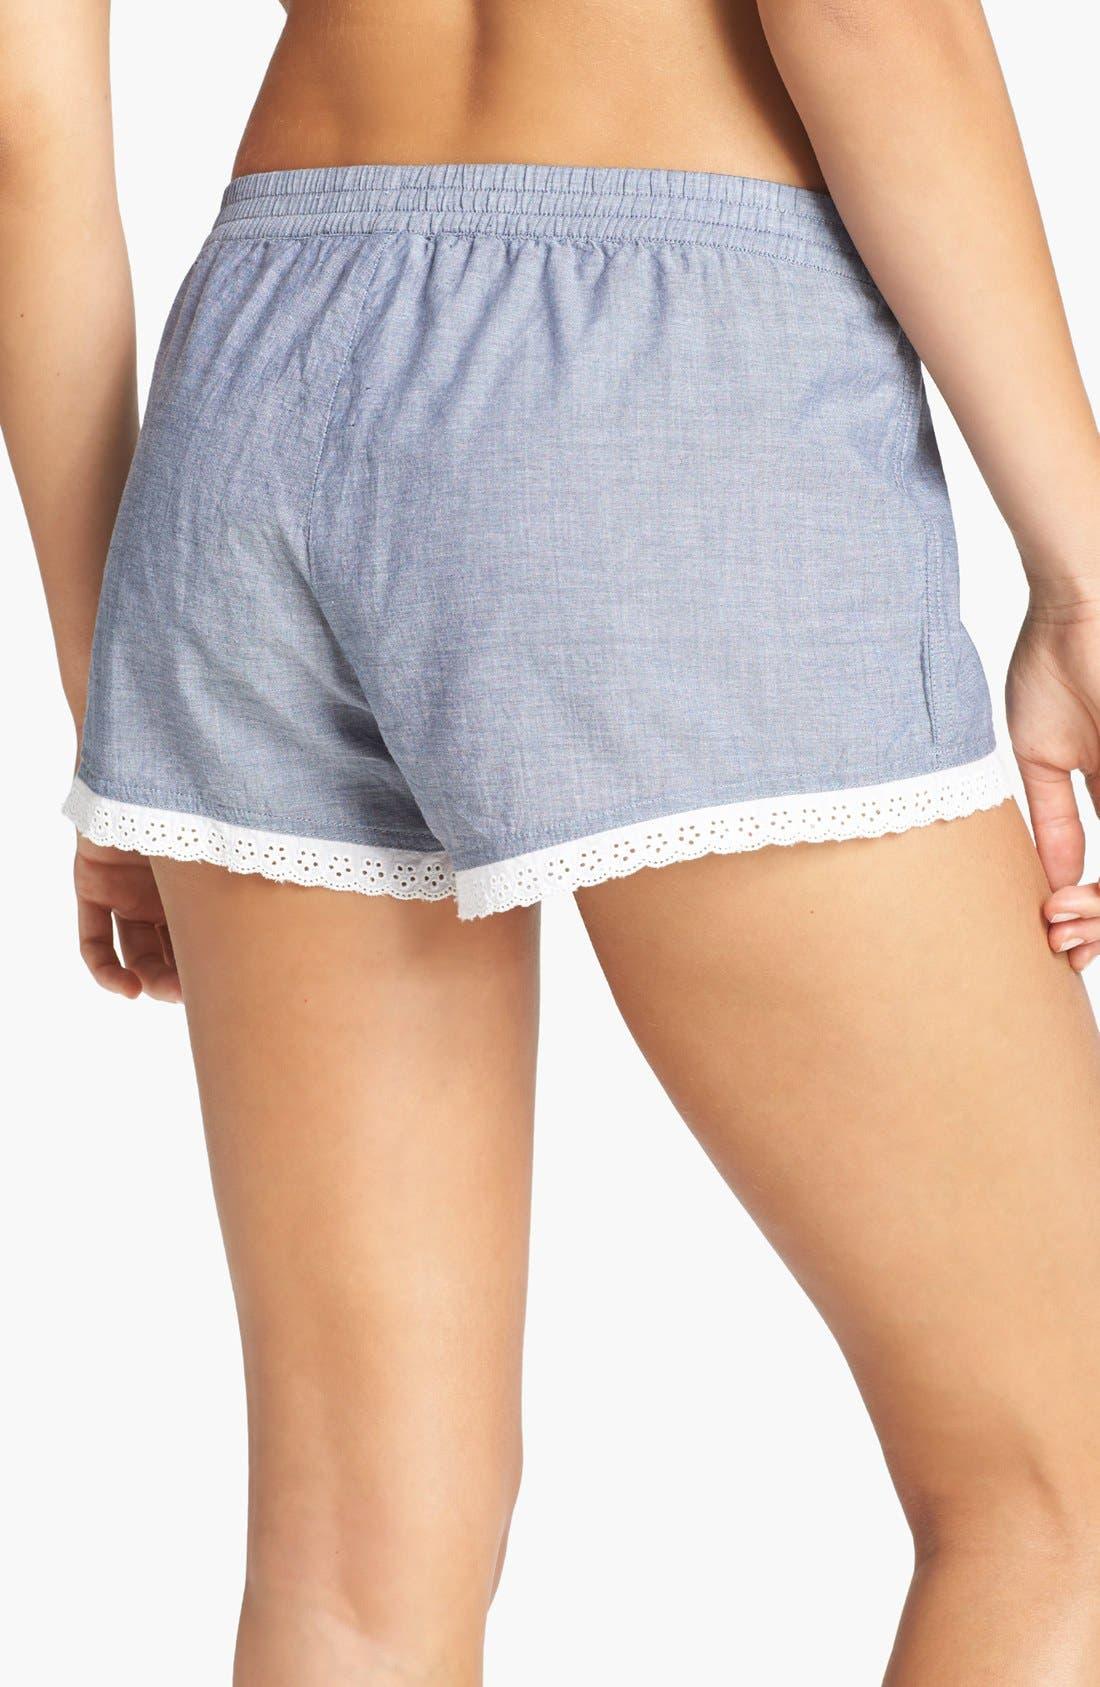 Alternate Image 2  - BP. Undercover 'Giddy Up' Shorts (Juniors)